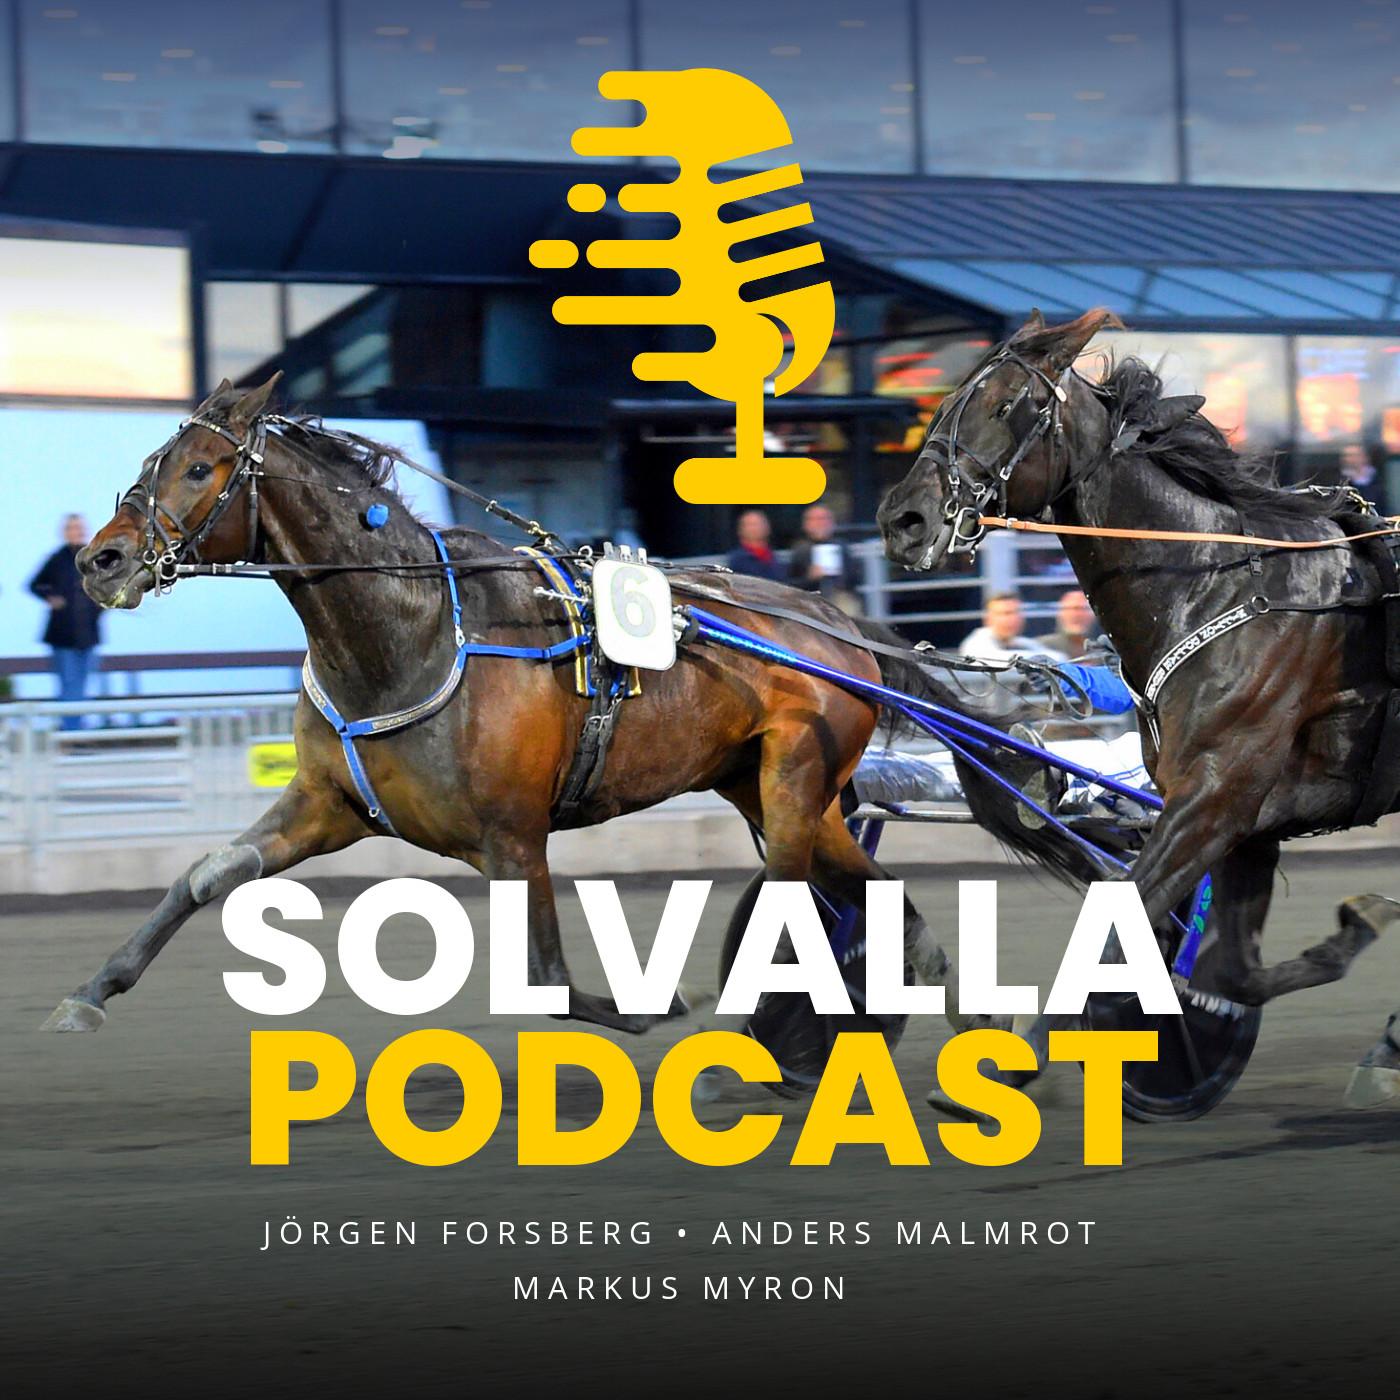 Solvalla Podcast show art